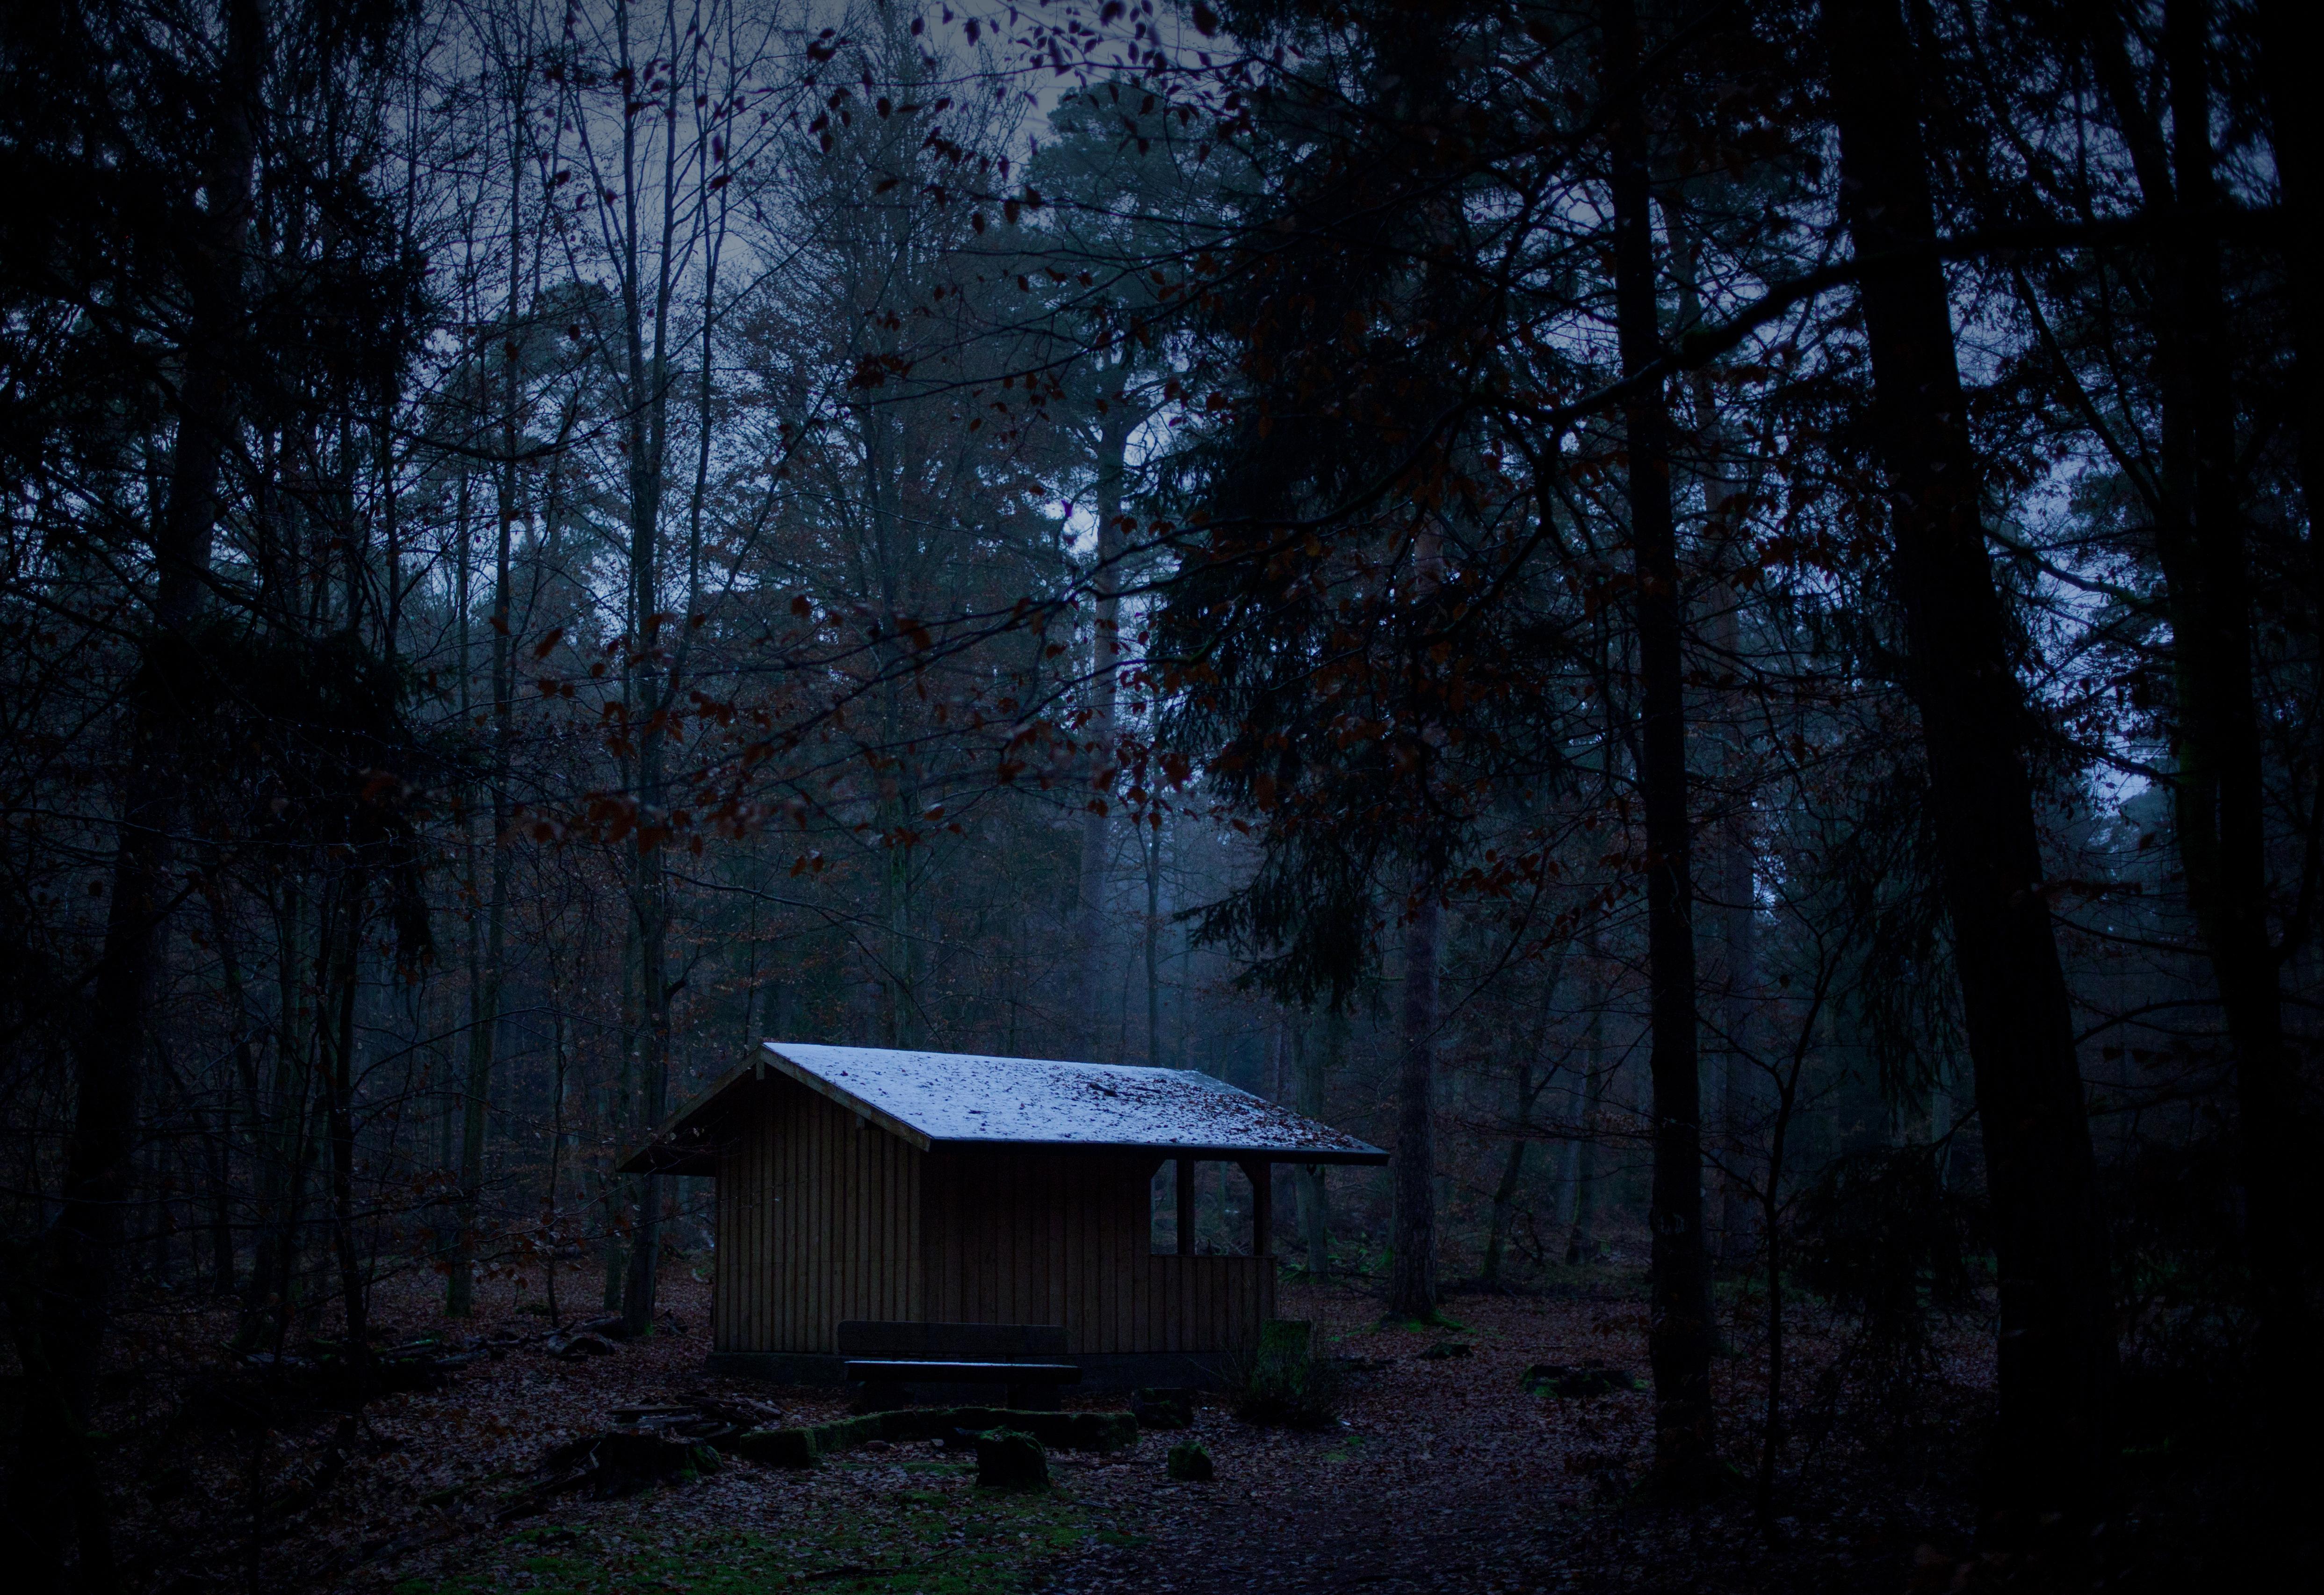 Wallpaper Wood Trees Tree Night Forest 35mm Canon Dark